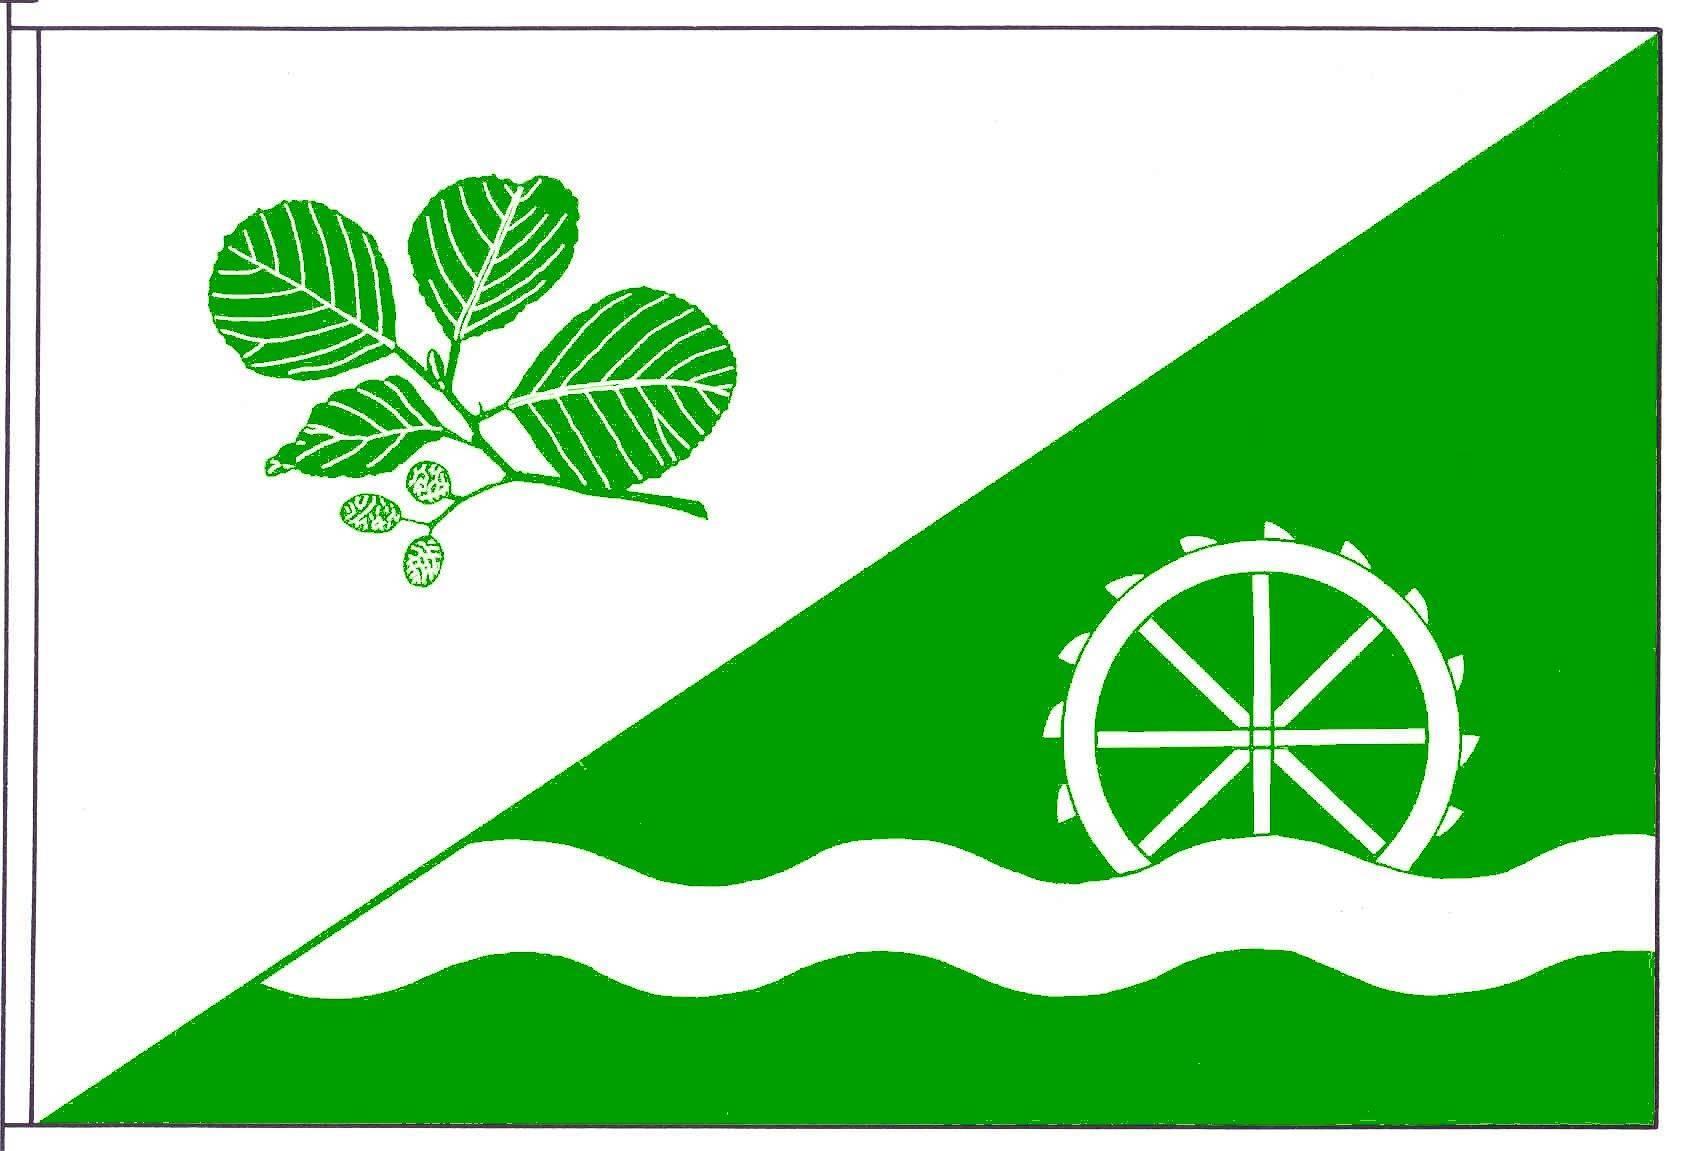 Flagge GemeindeElsdorf-Westermühlen, Kreis Rendsburg-Eckernförde